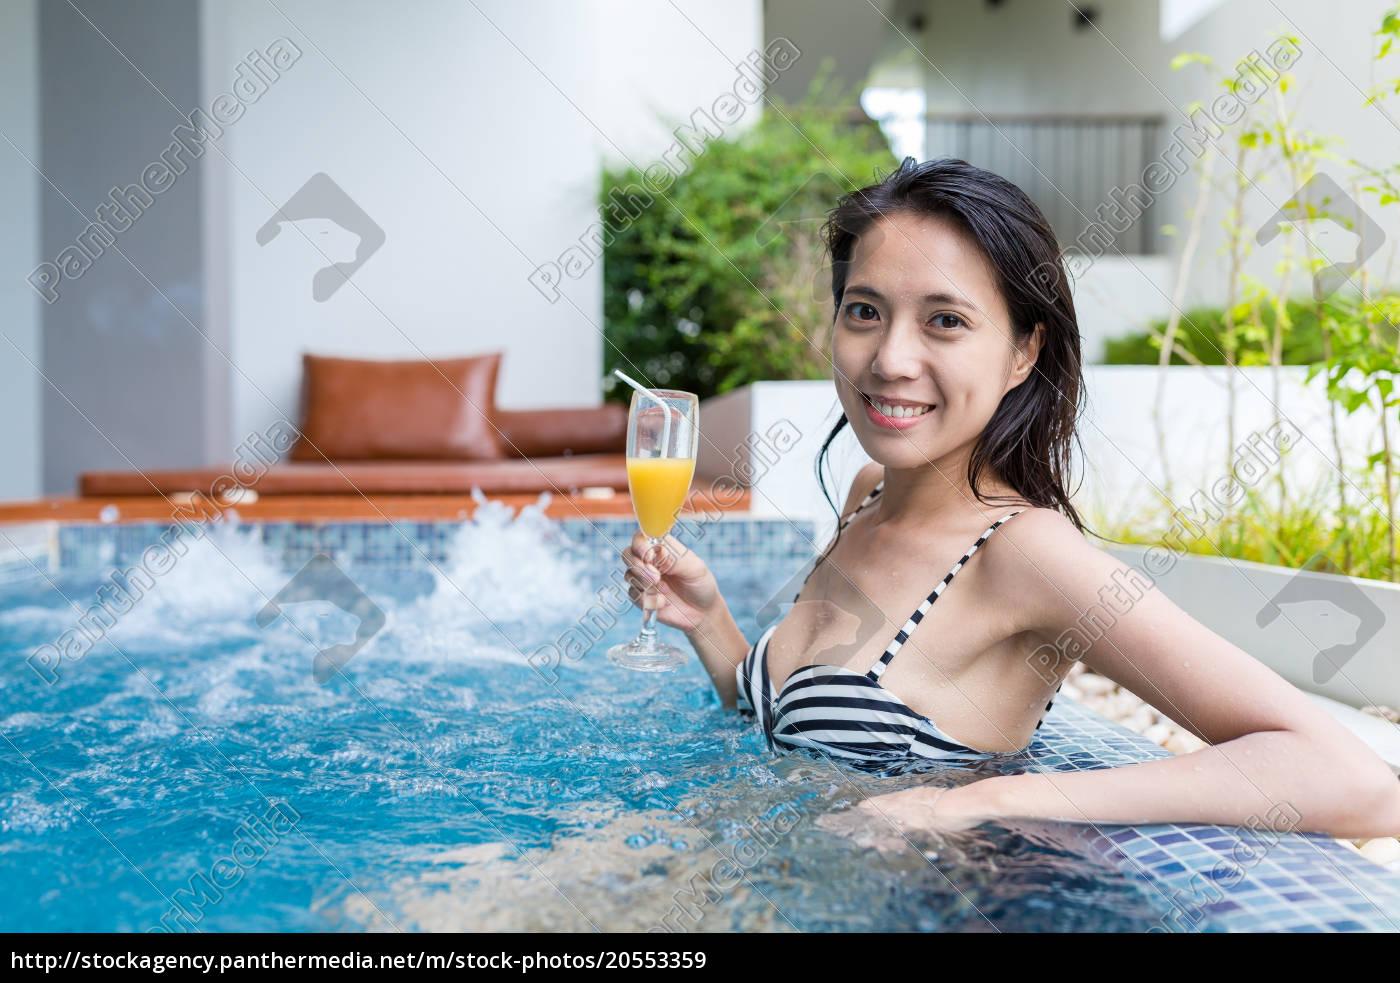 woman, enjoy, in, jacuzzi, spa - 20553359